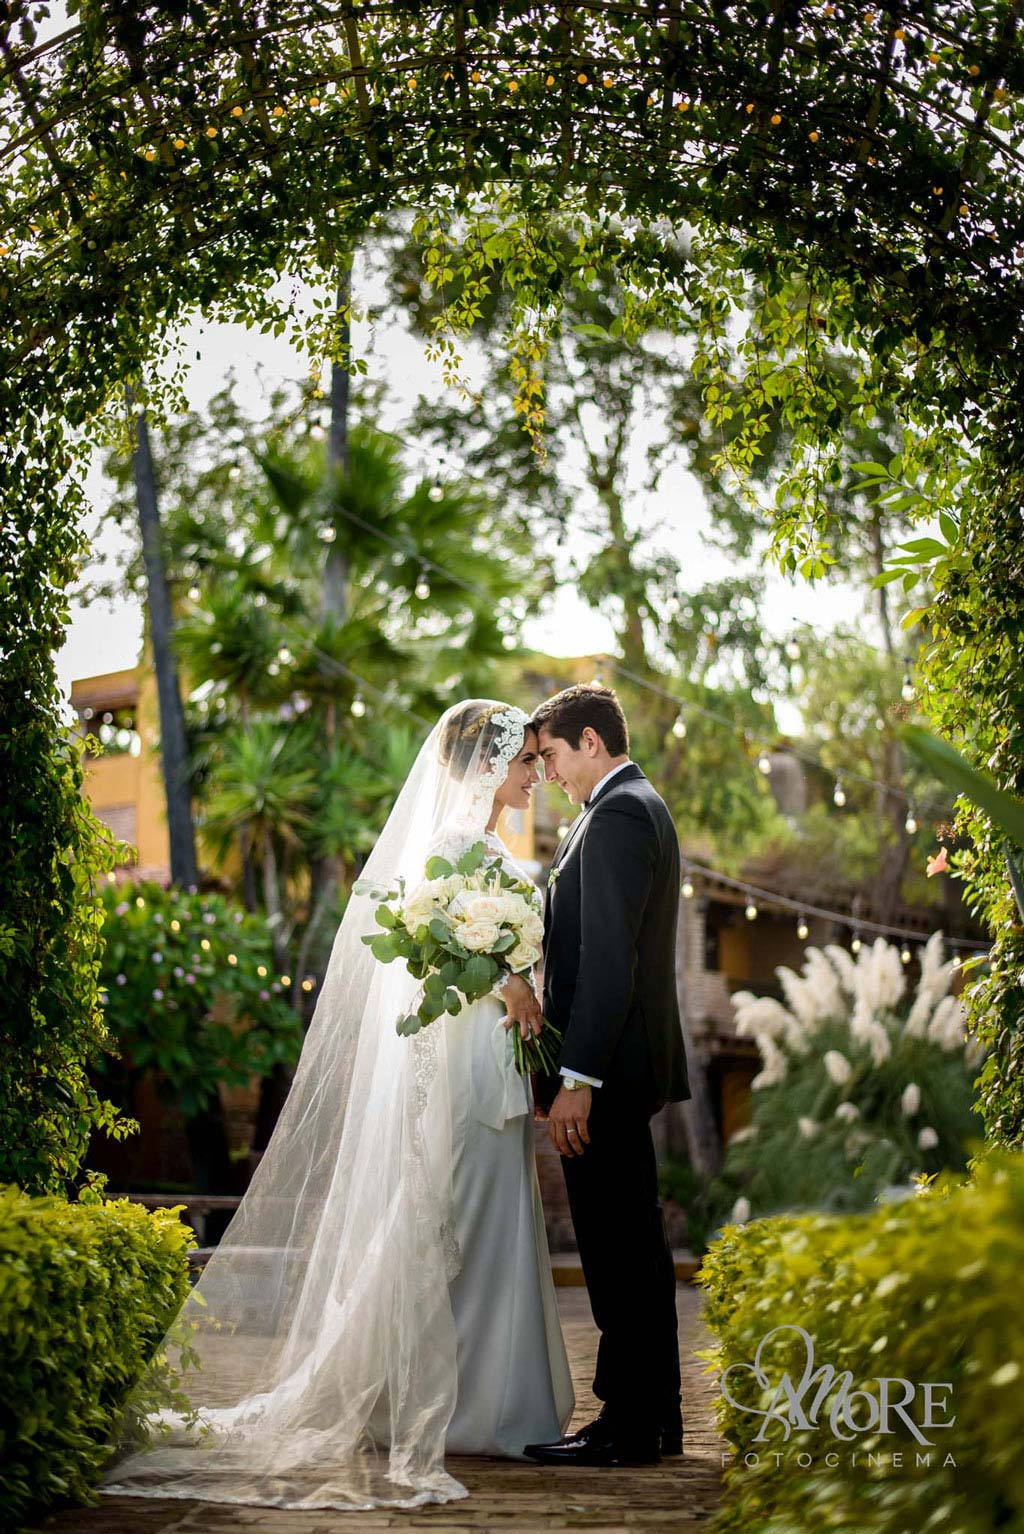 Fotografia de bodas en Tepatitlan Jal